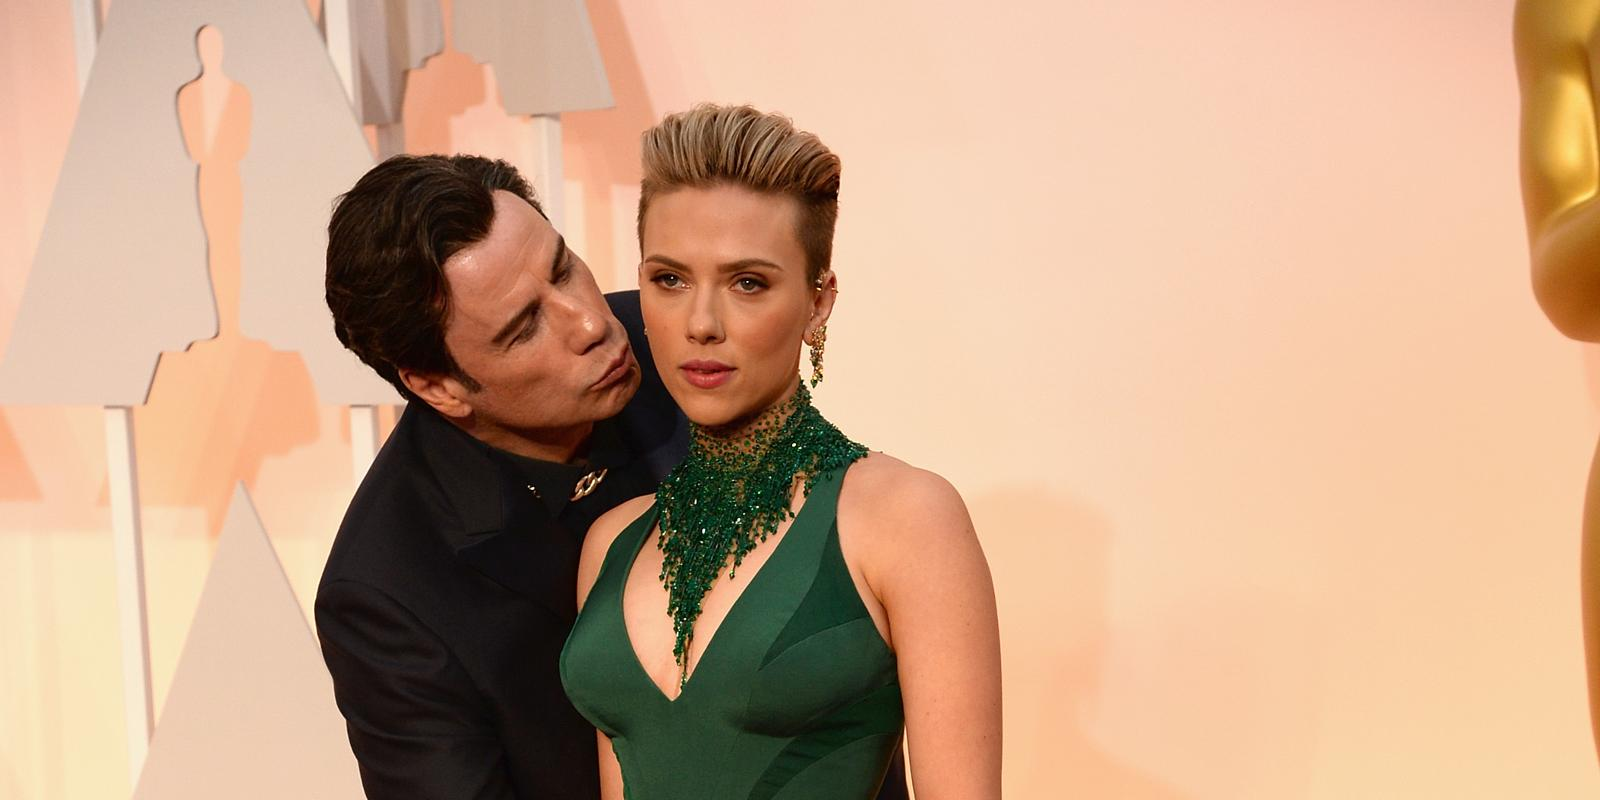 John Travolta Creeps Up On Scarlett Johansson For Awkward Surprise Kiss